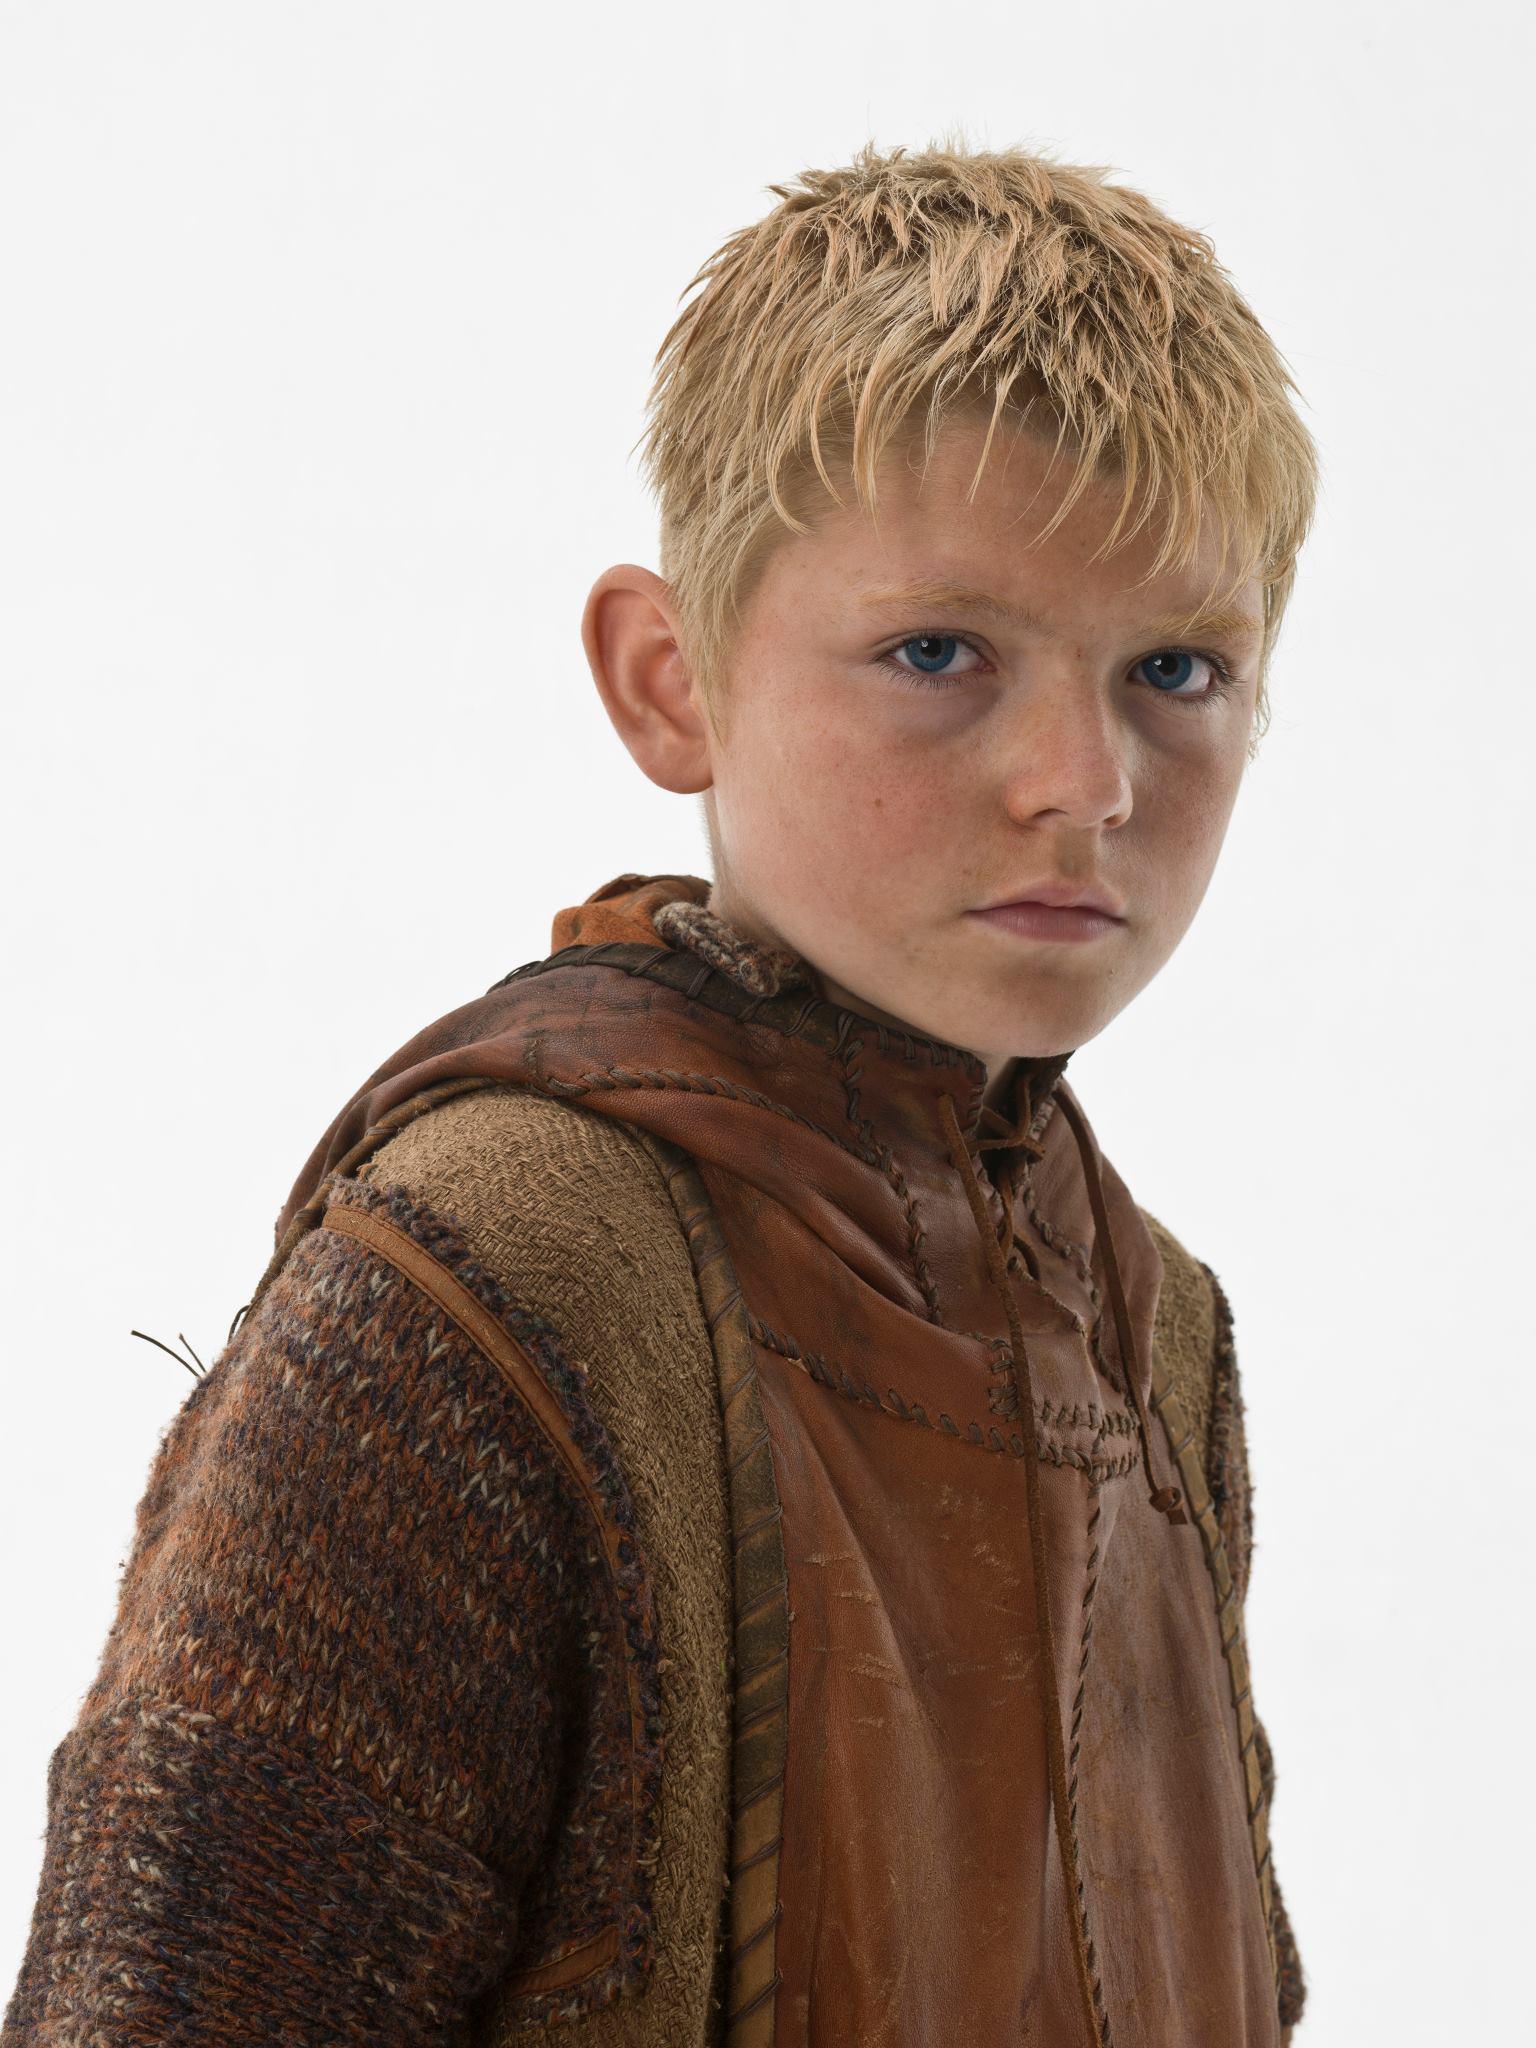 Image - Bjorn S01P01.jpg | Vikings Wiki | FANDOM powered